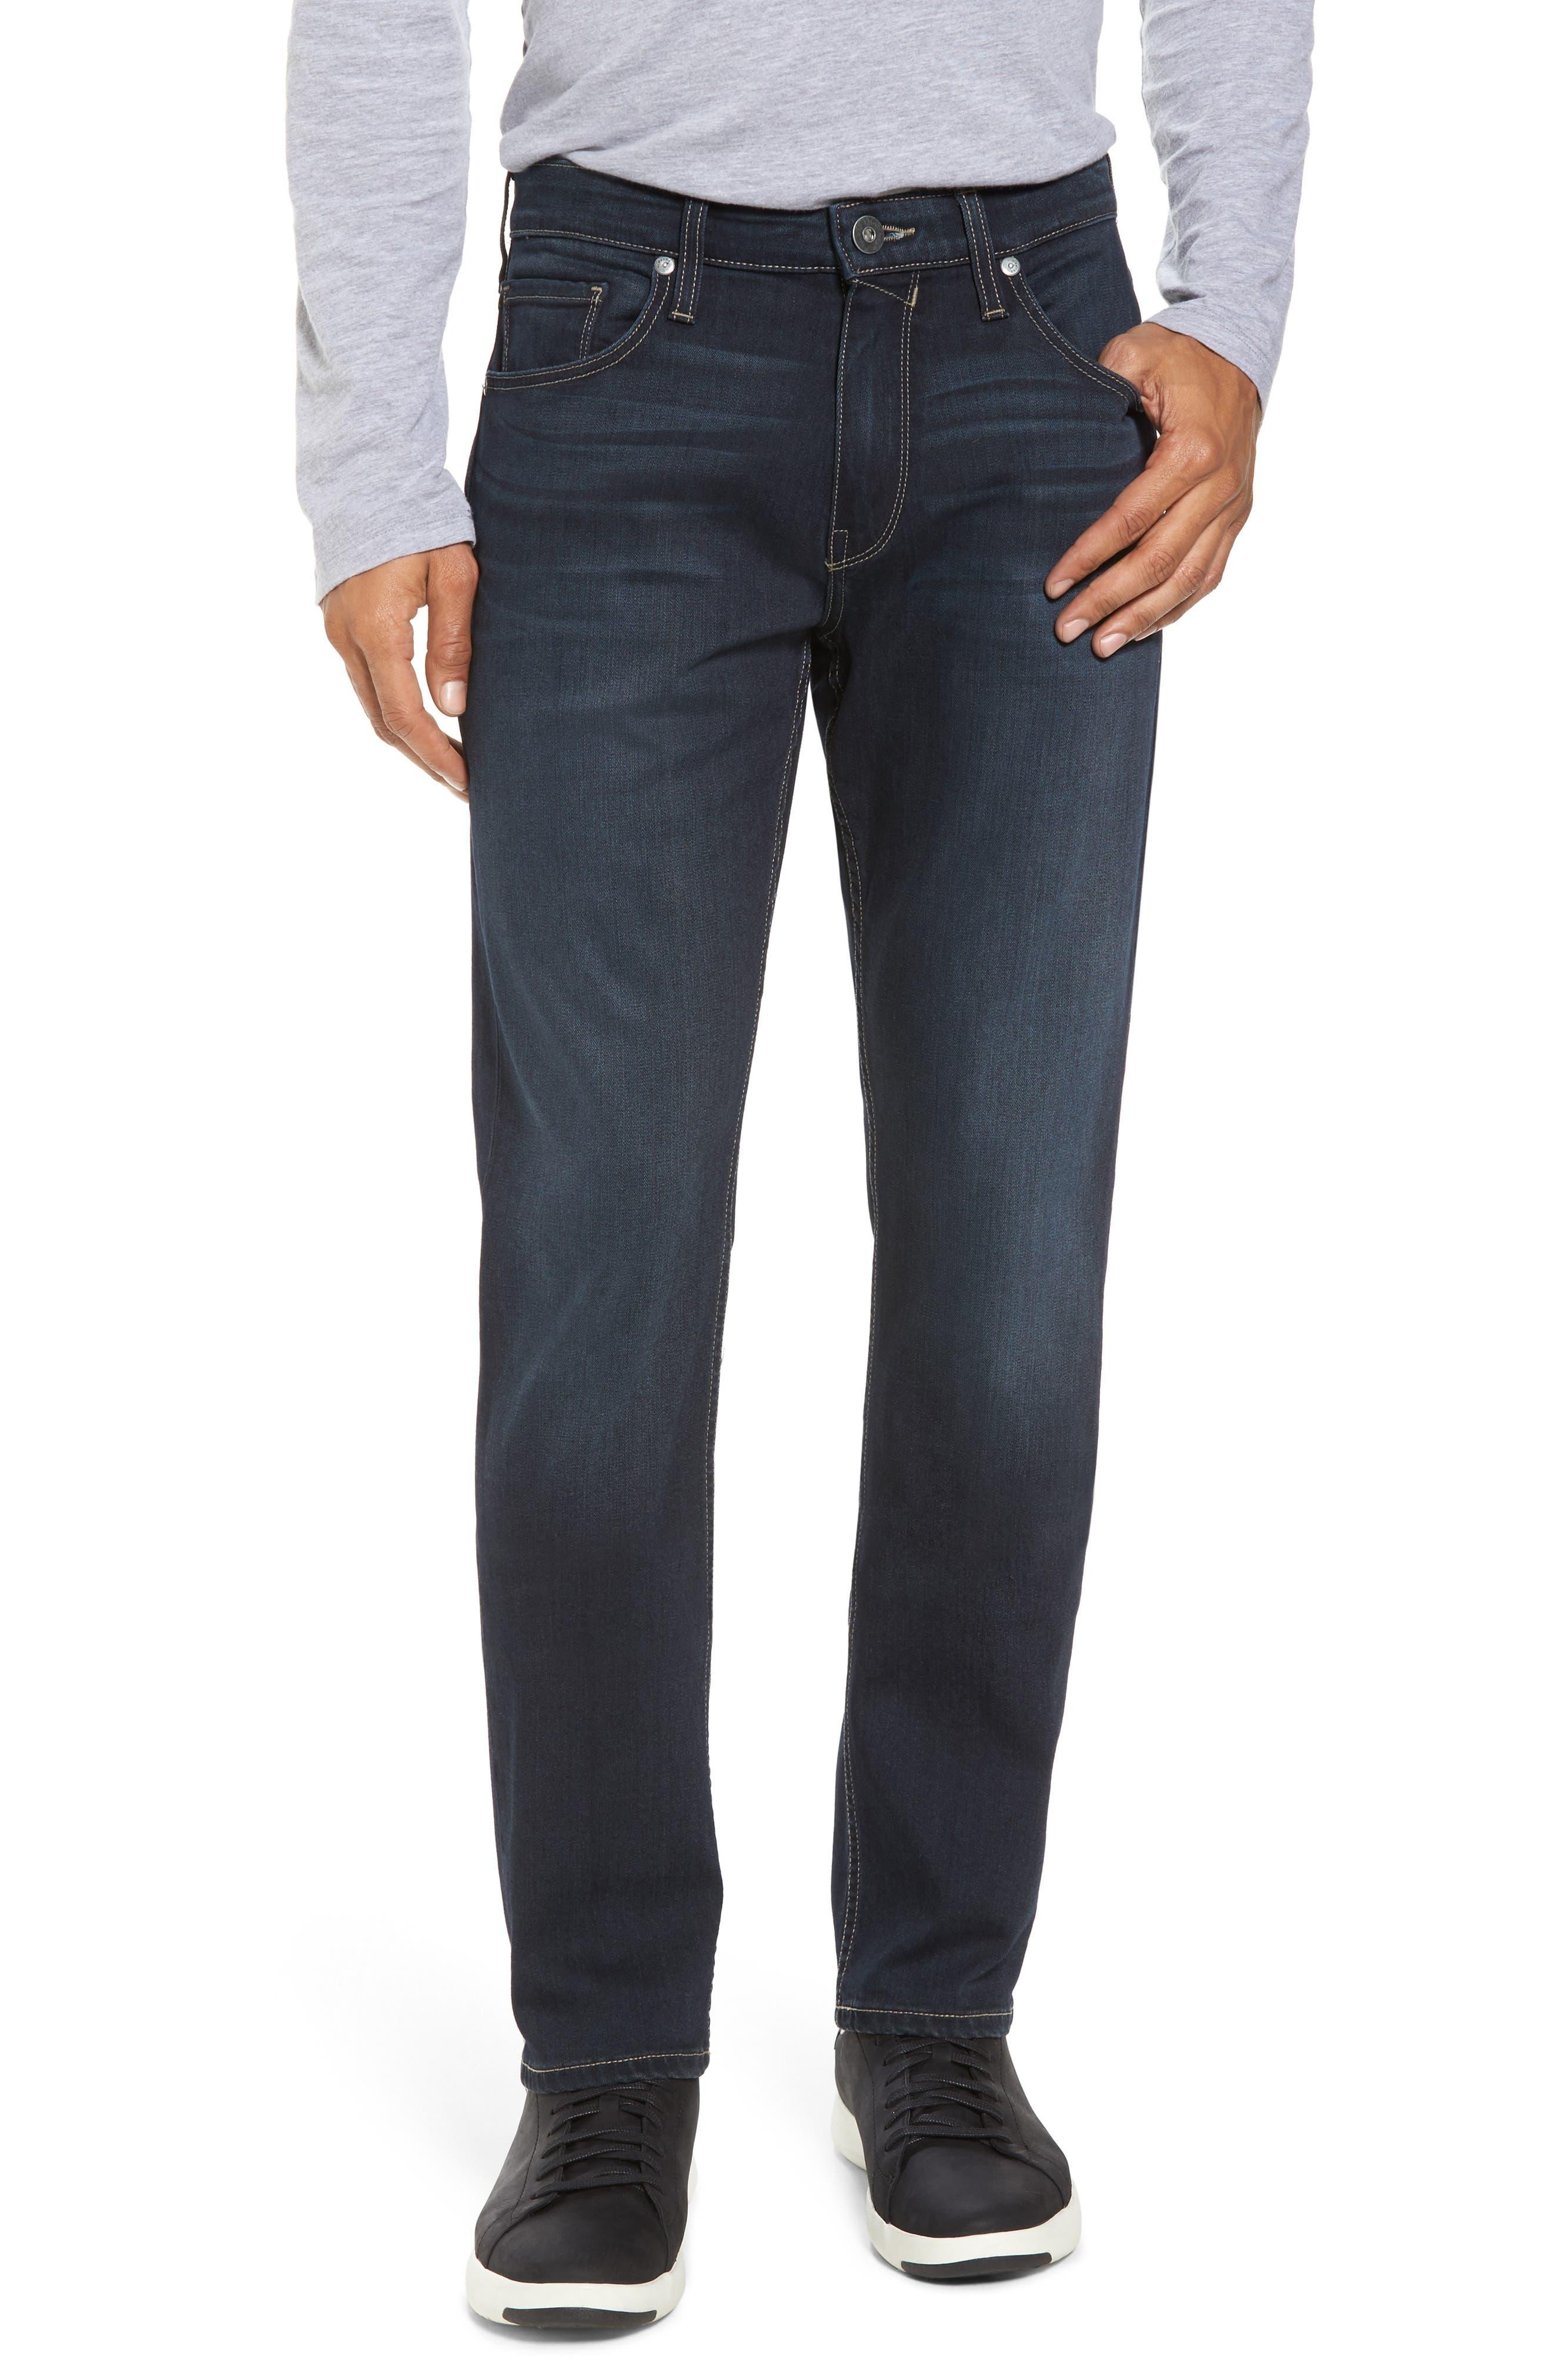 Alternate Image 1 Selected - PAIGE Transcend - Federal Slim Straight Leg Jeans (Wilkins)